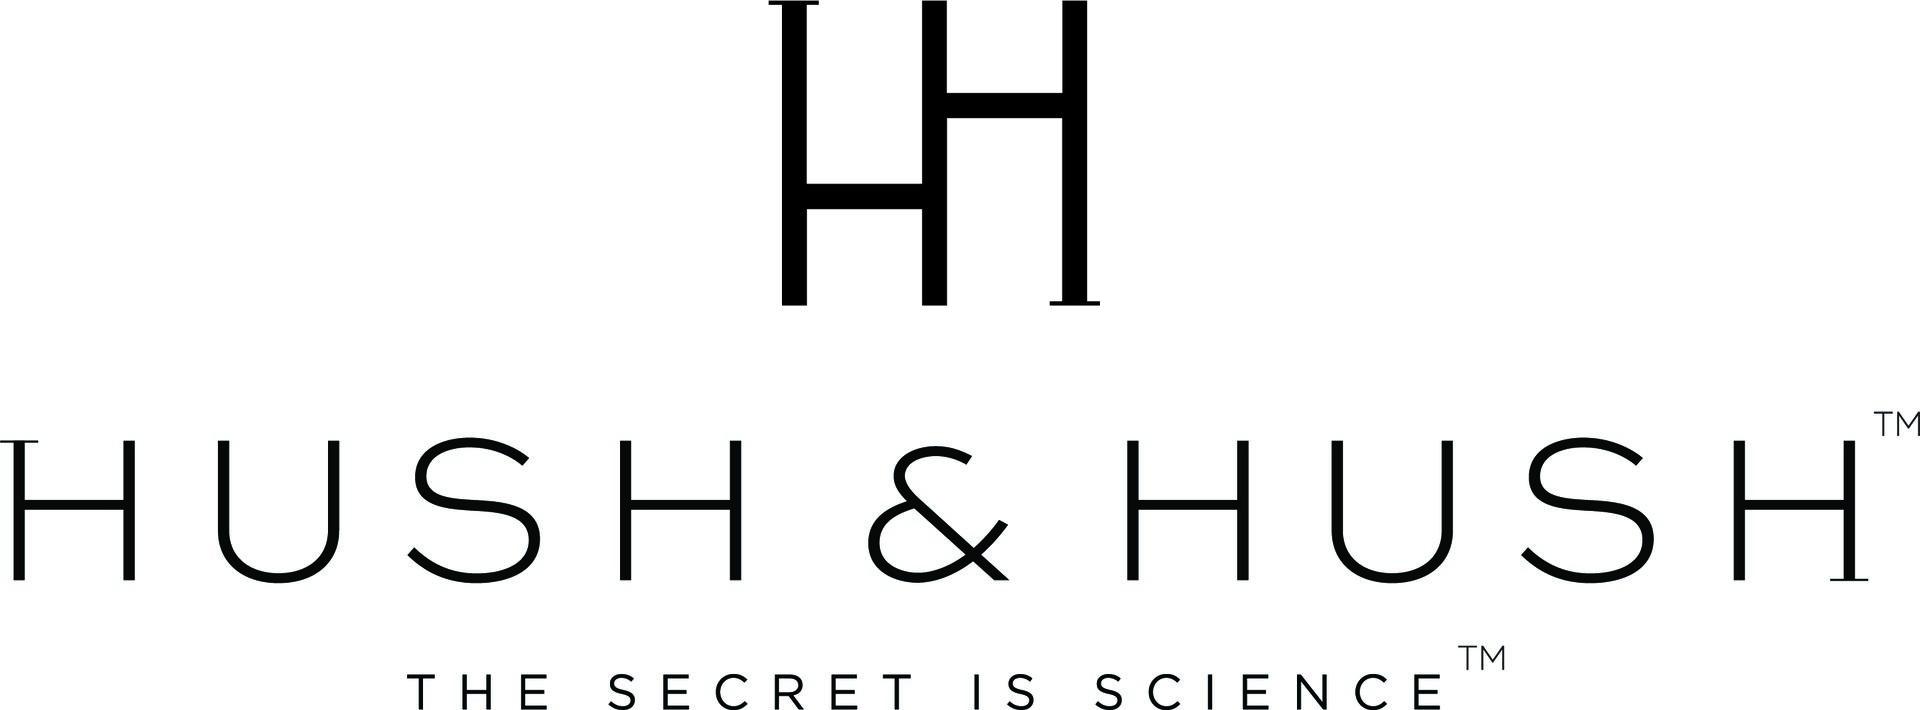 HUSH&HUSH